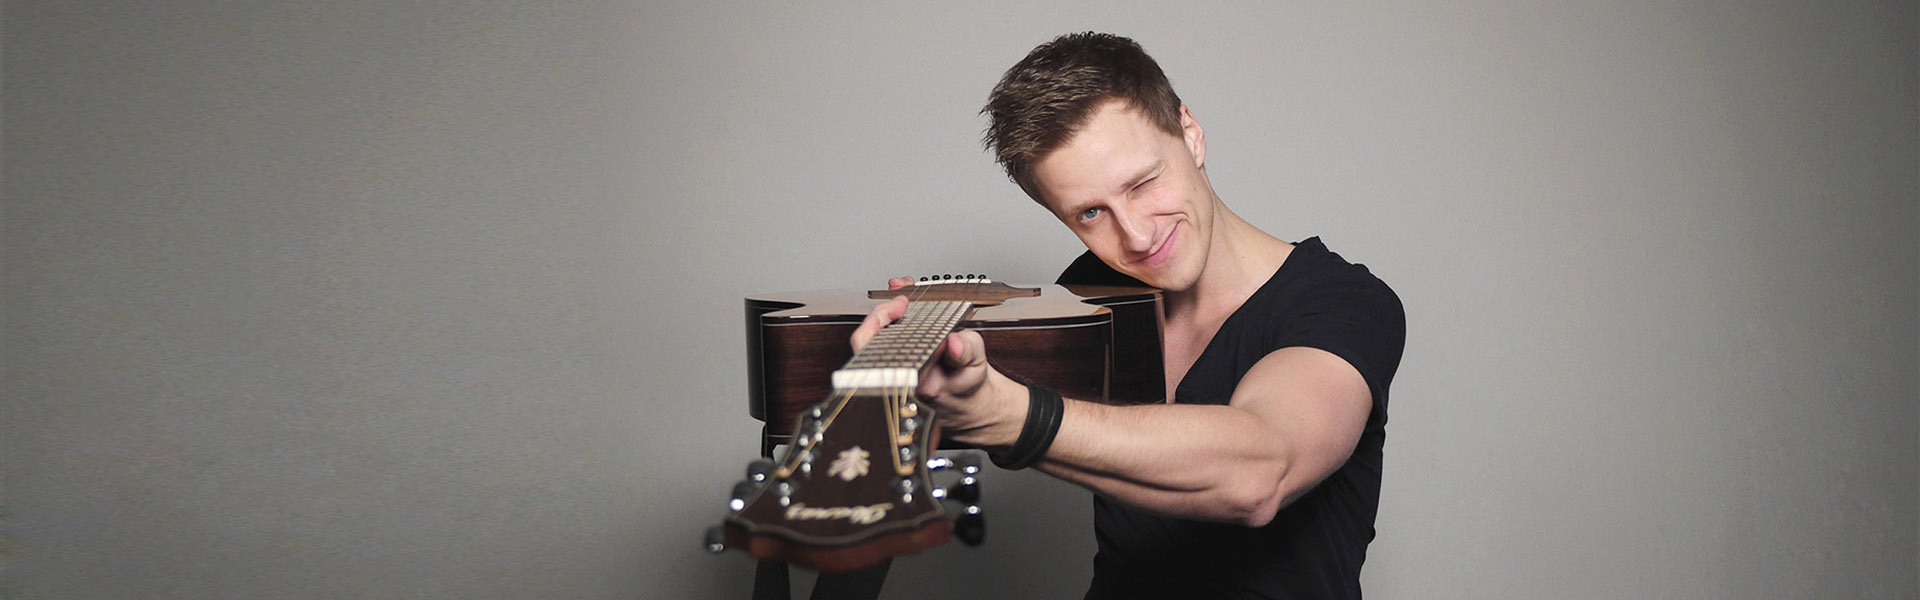 Tobias Rauscher - Modern Percussive Fingerstyle Guitarist